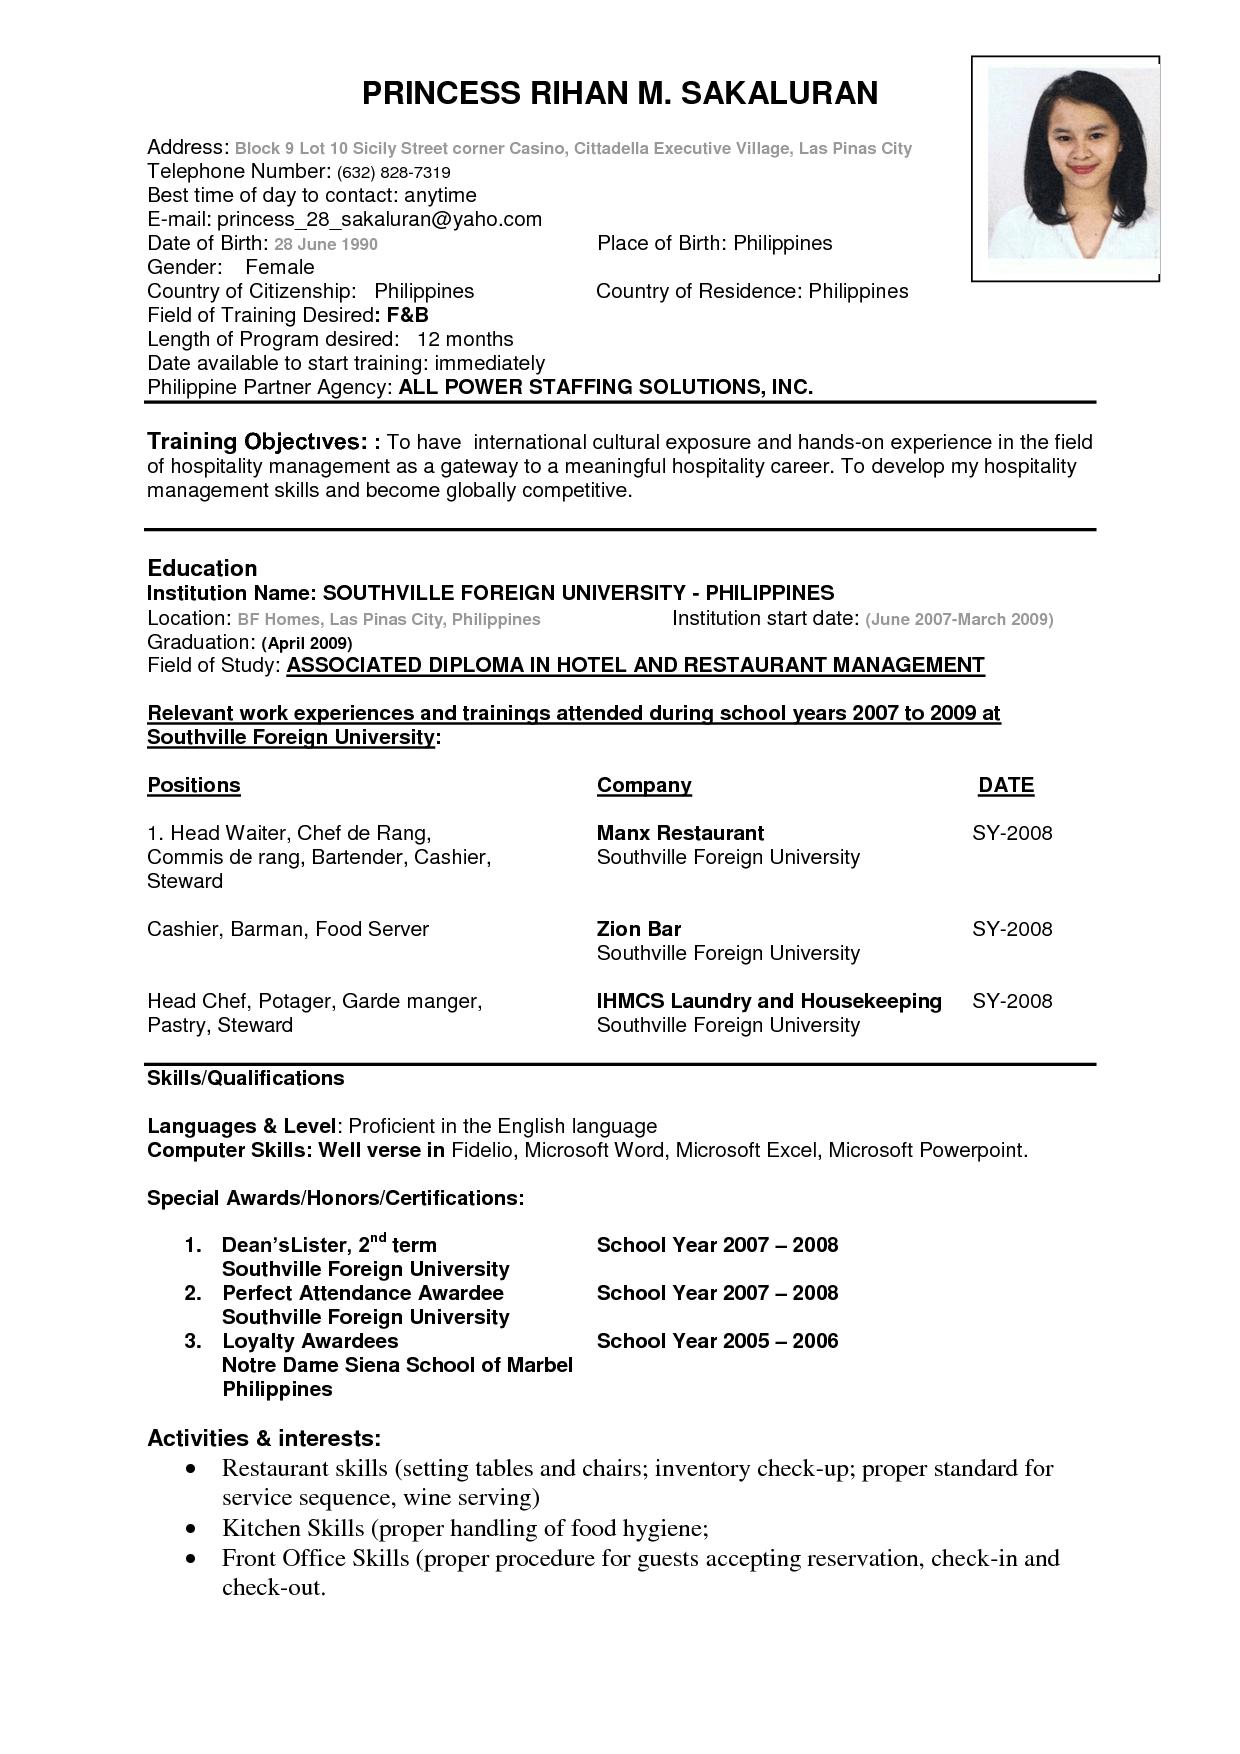 Resume Sample For Job Application Pdf Philippines